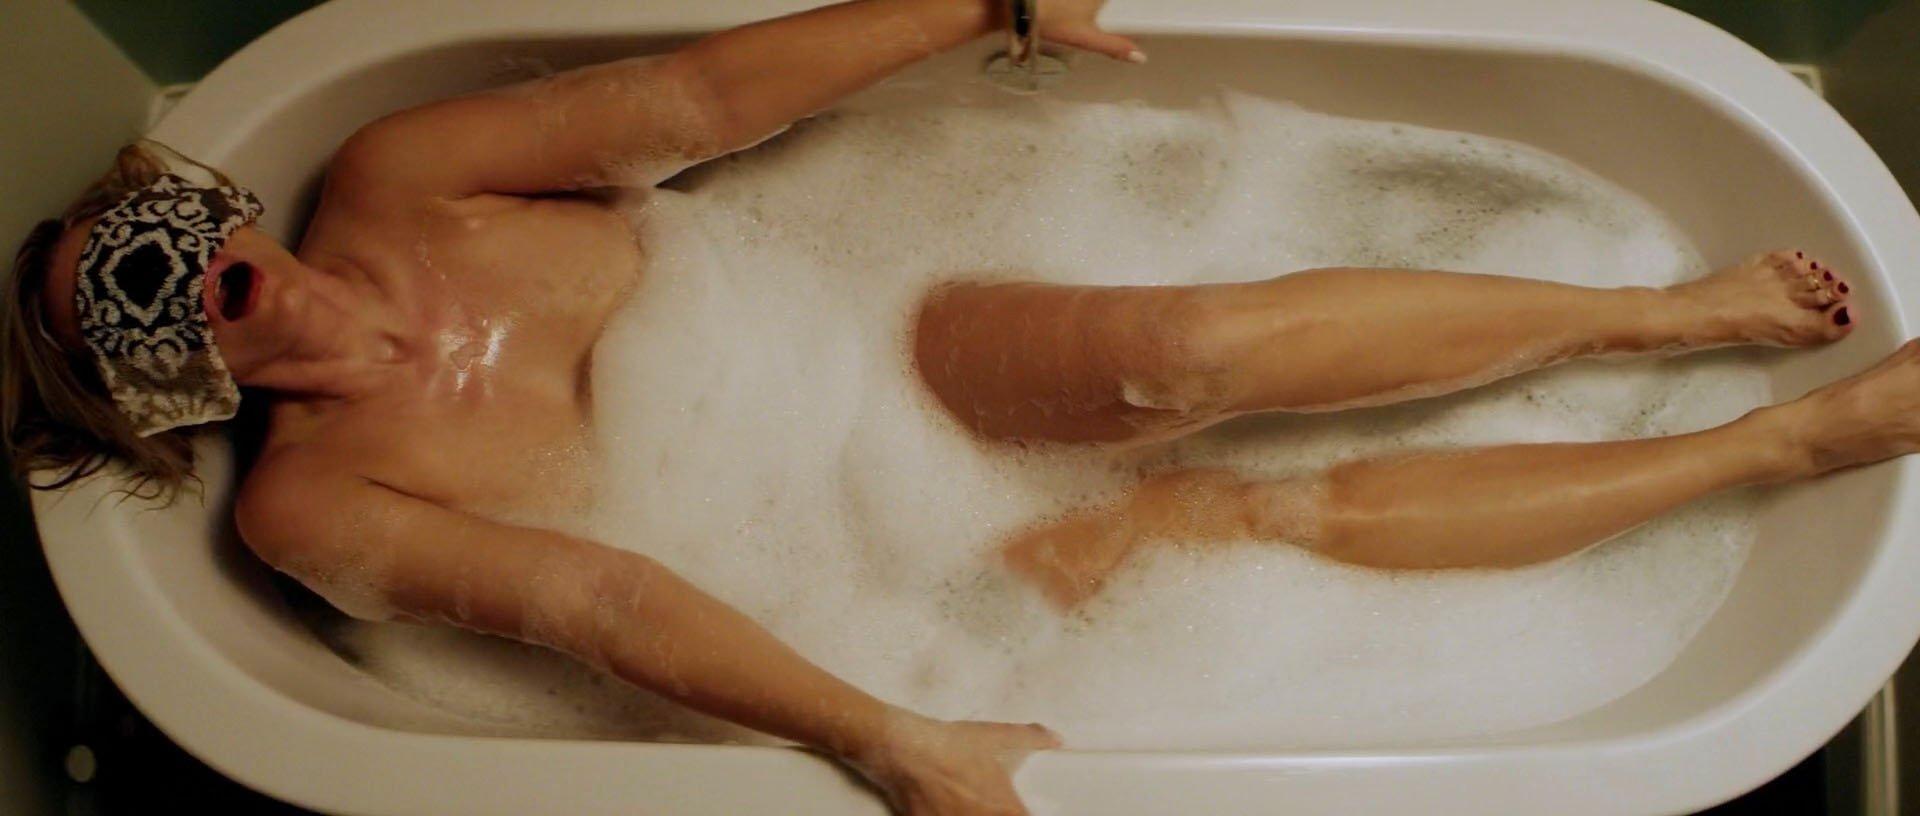 Natasha Henstridge sexy - The Black Room (2016)